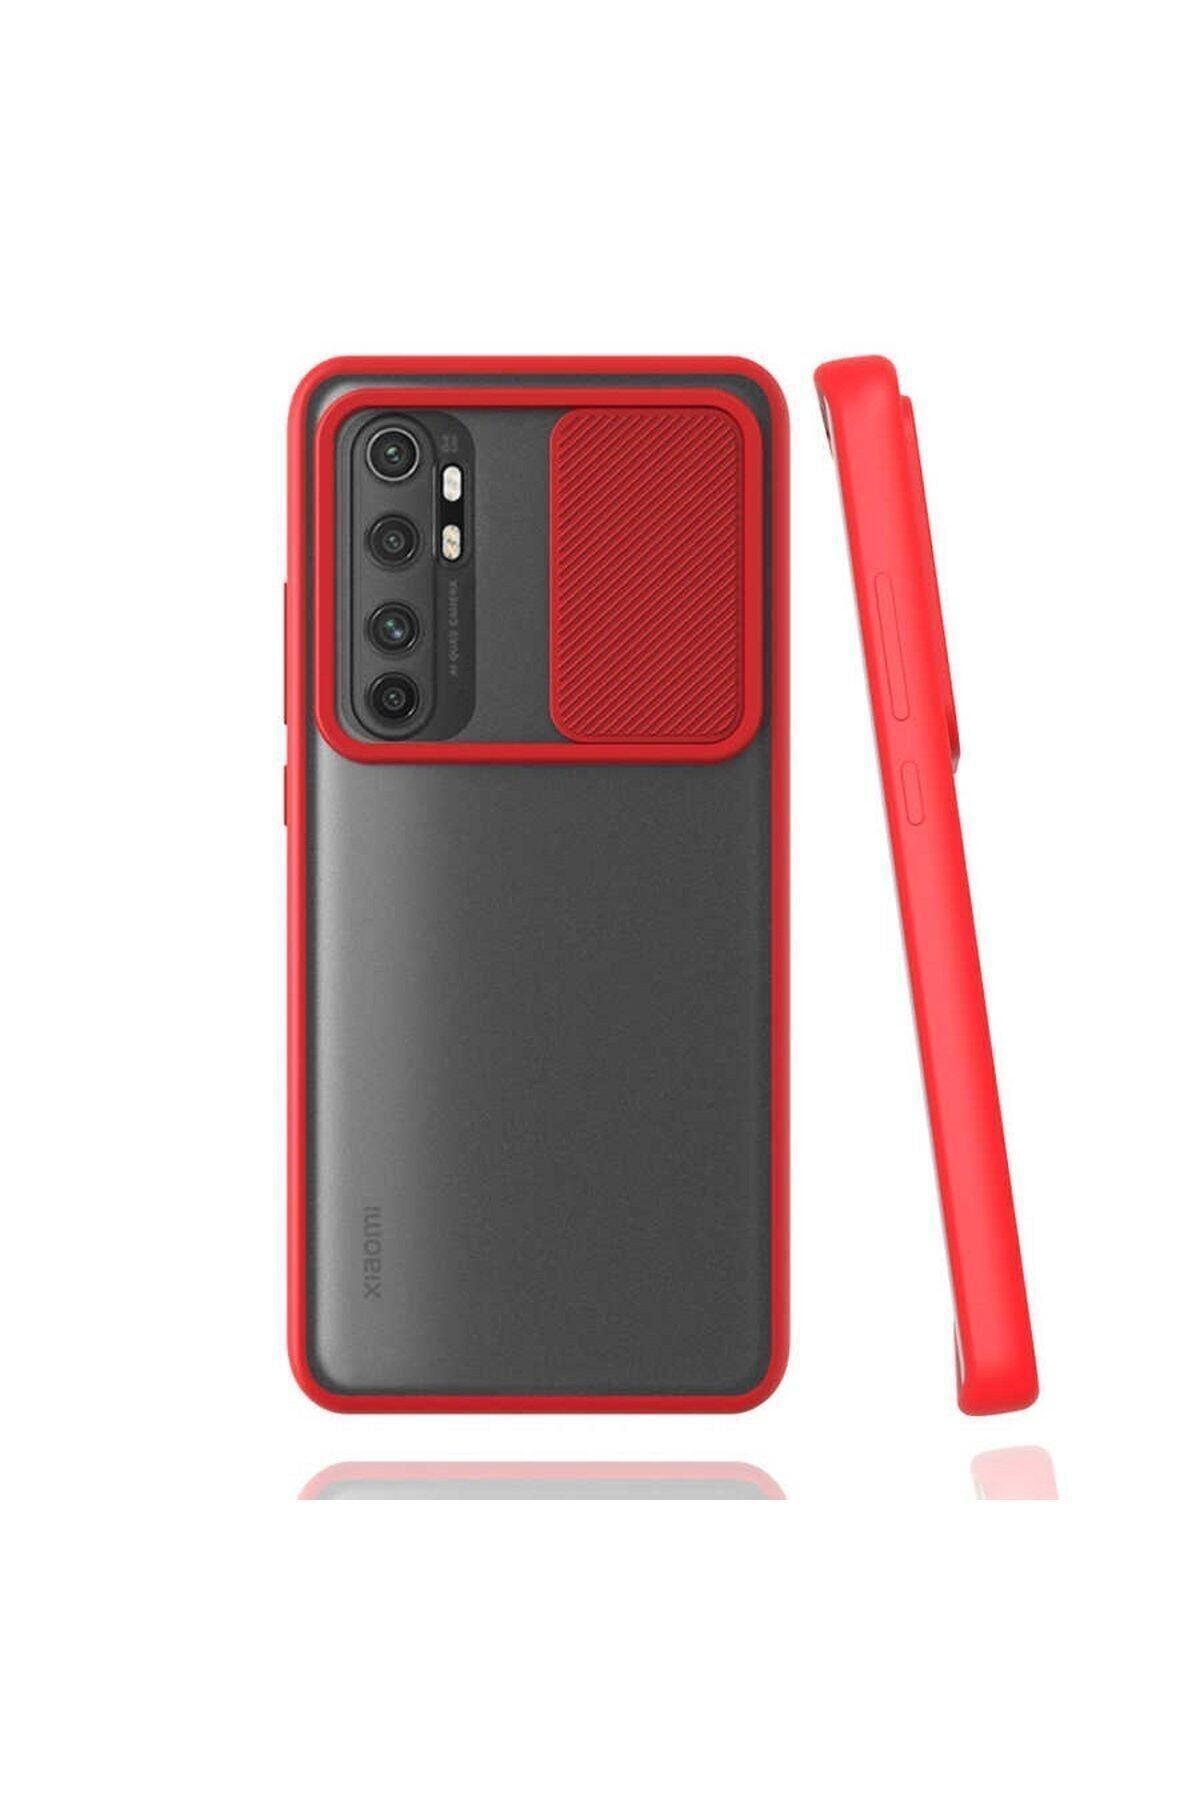 Teleface Xiaomi Mi Note 10 Lite Kılıf Slayt Kamera Korumalı 1